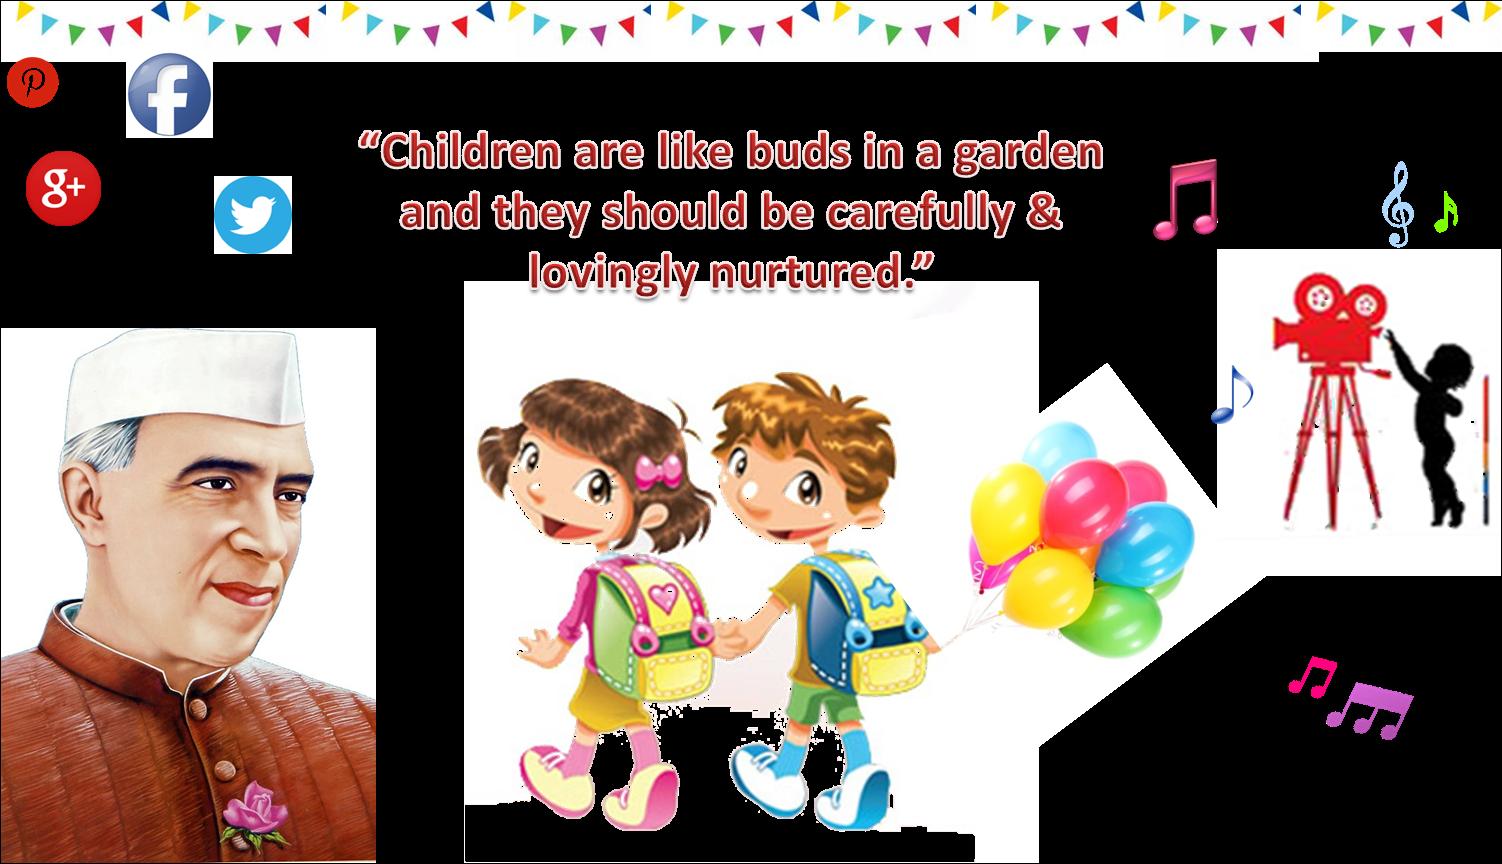 Children's Day Celebration in India